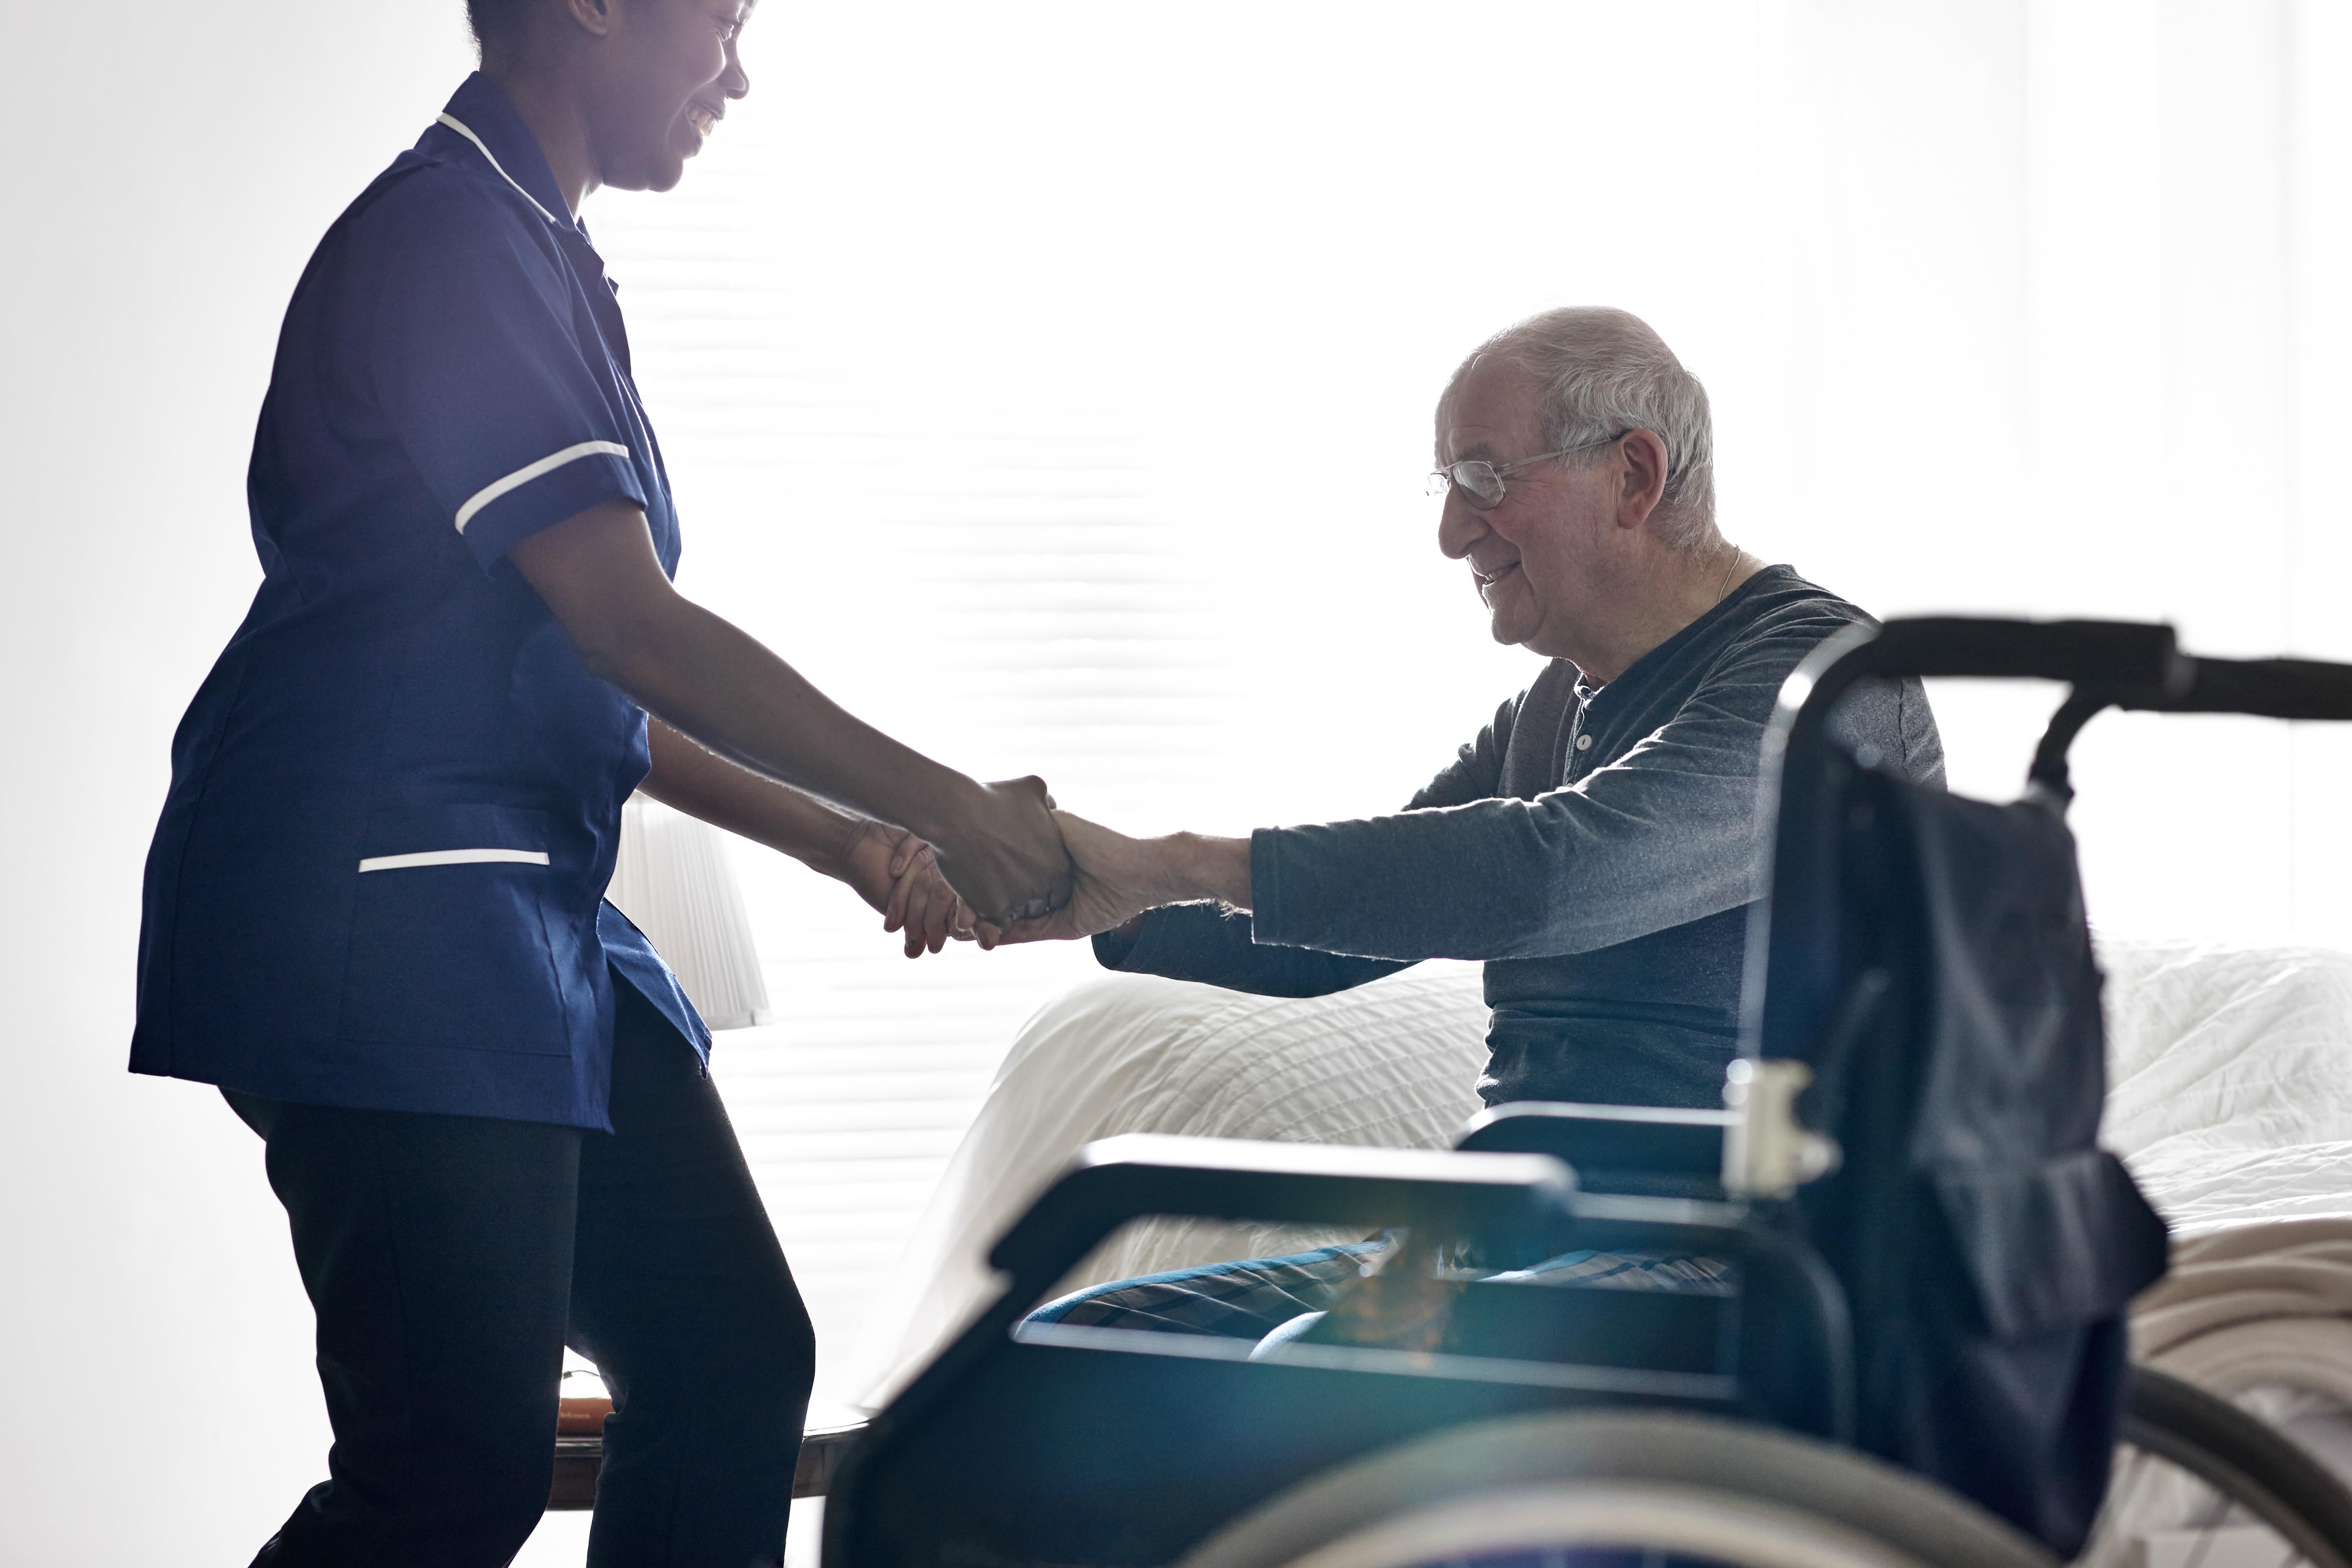 Caretaker assisting resident at York Gardens in Edina, MN